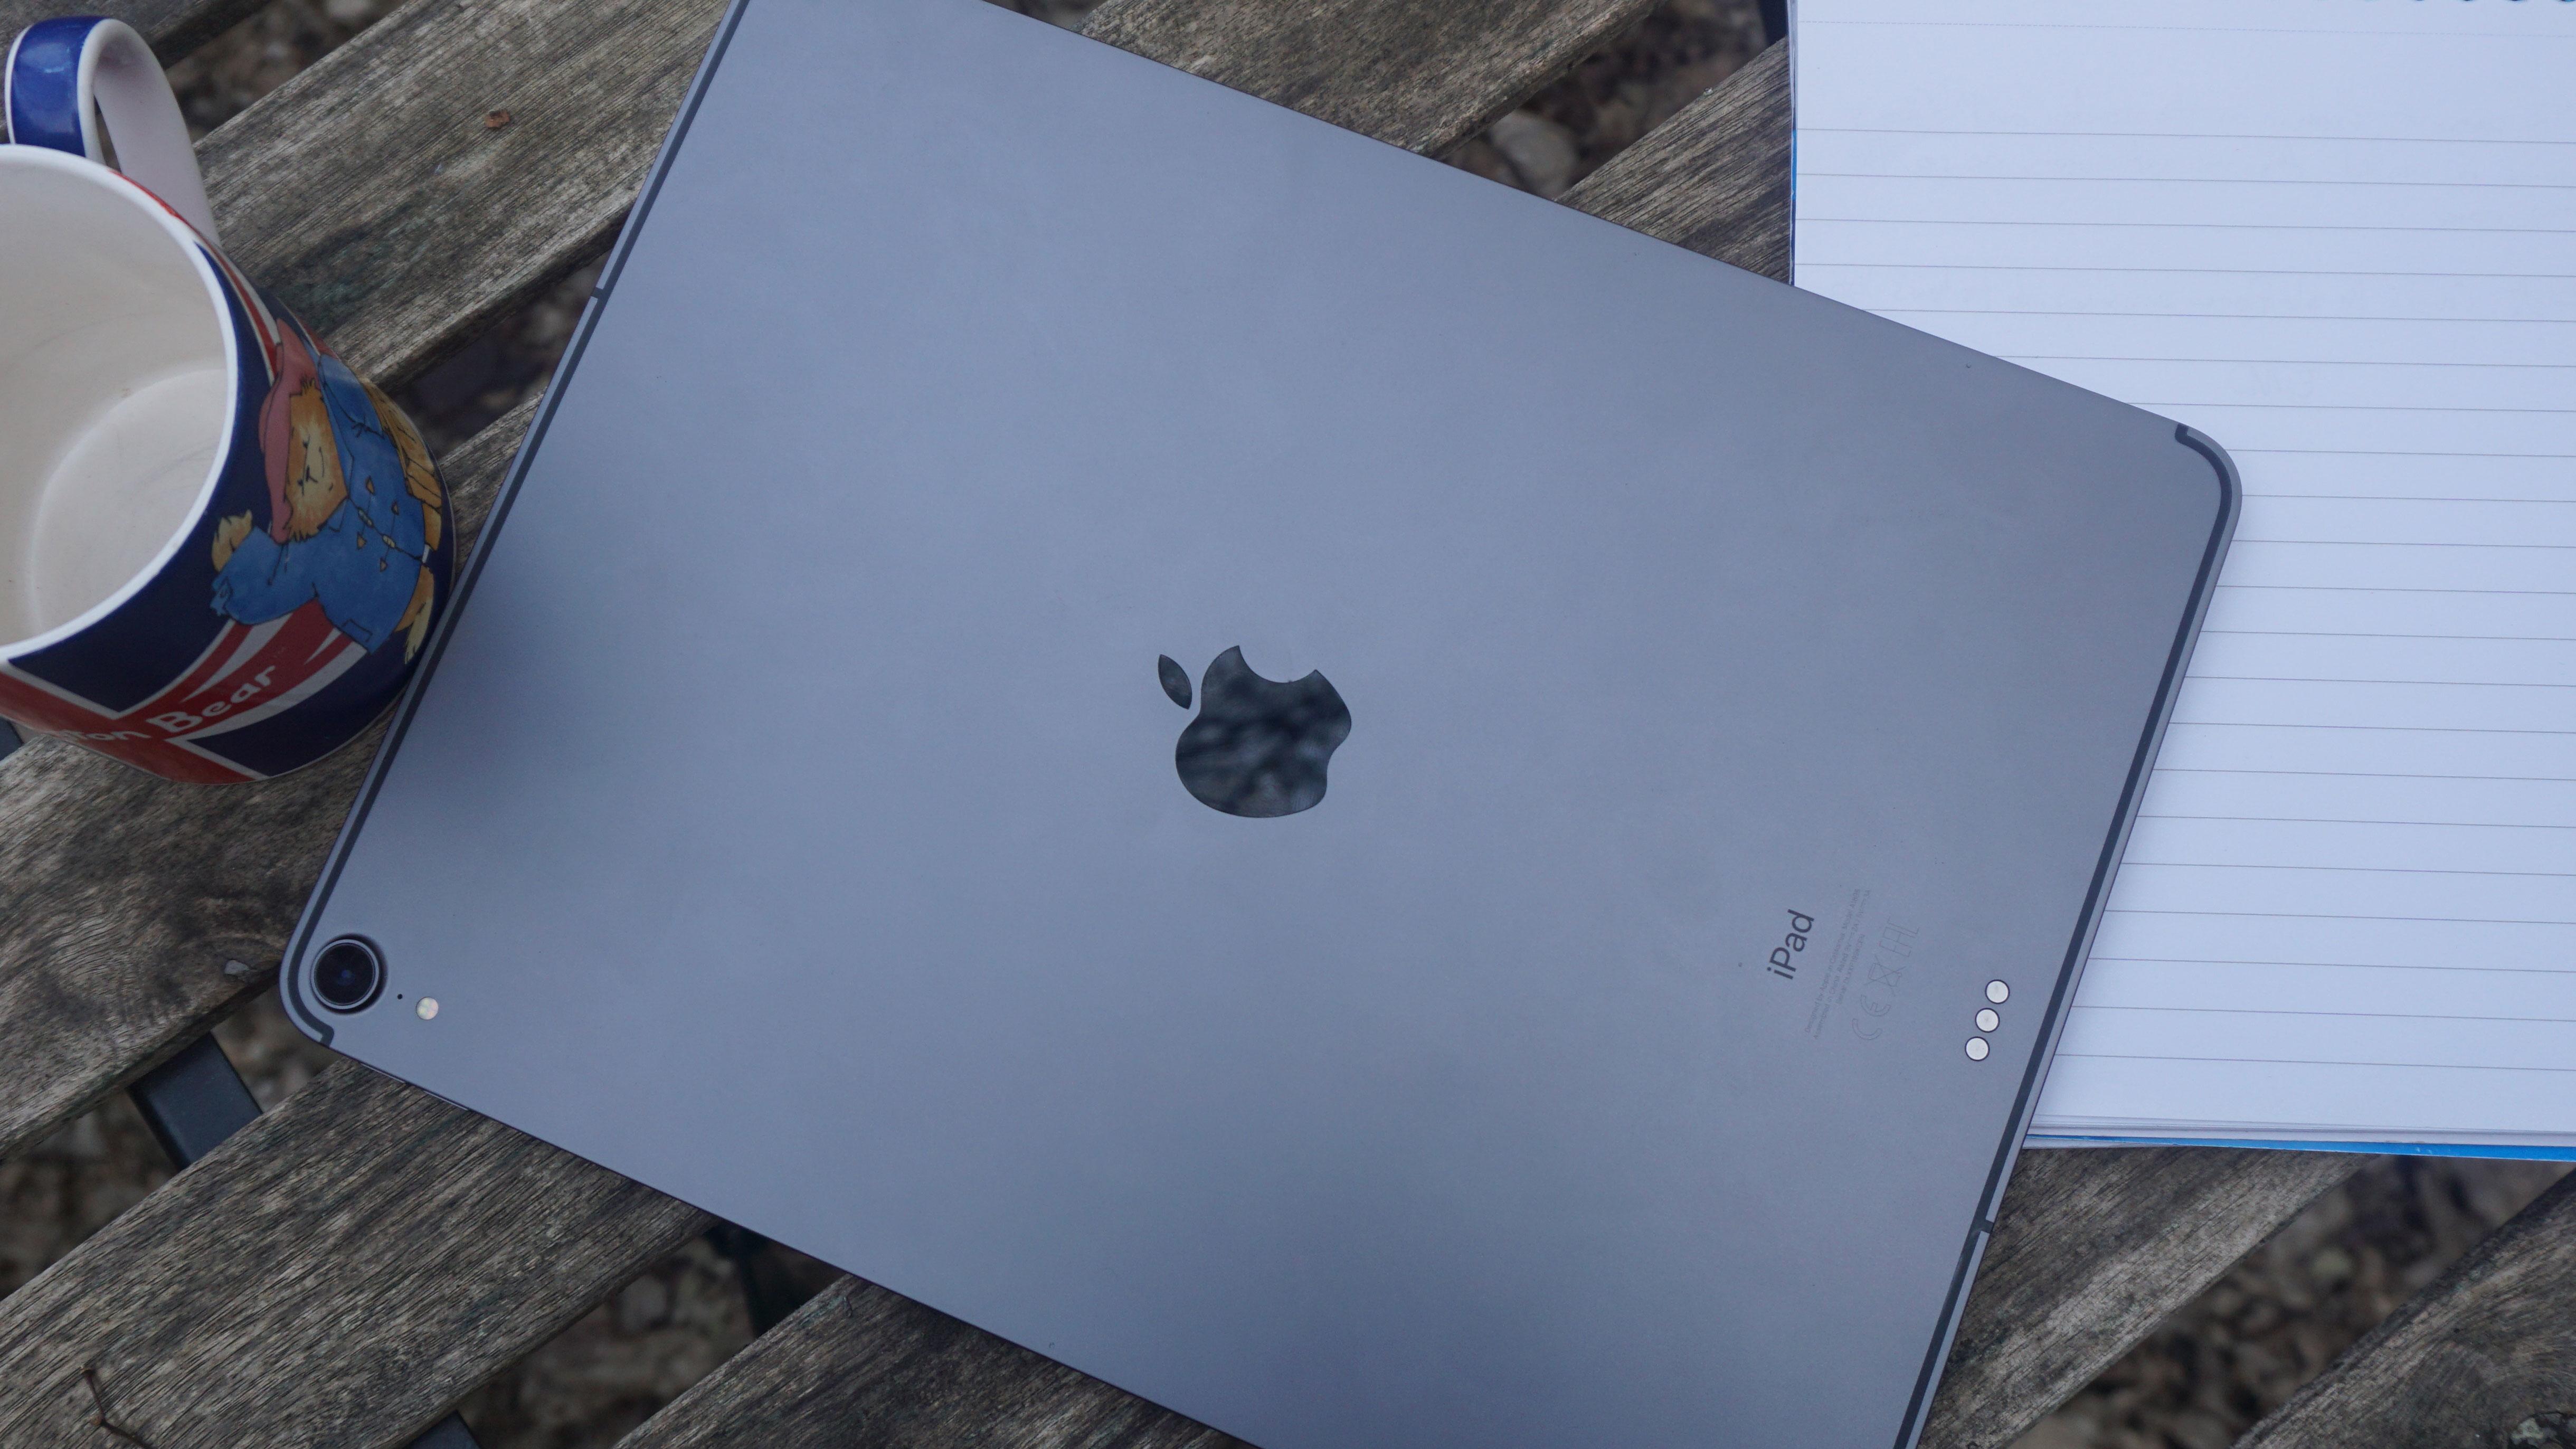 The tablet back. Image credit: TechRadar